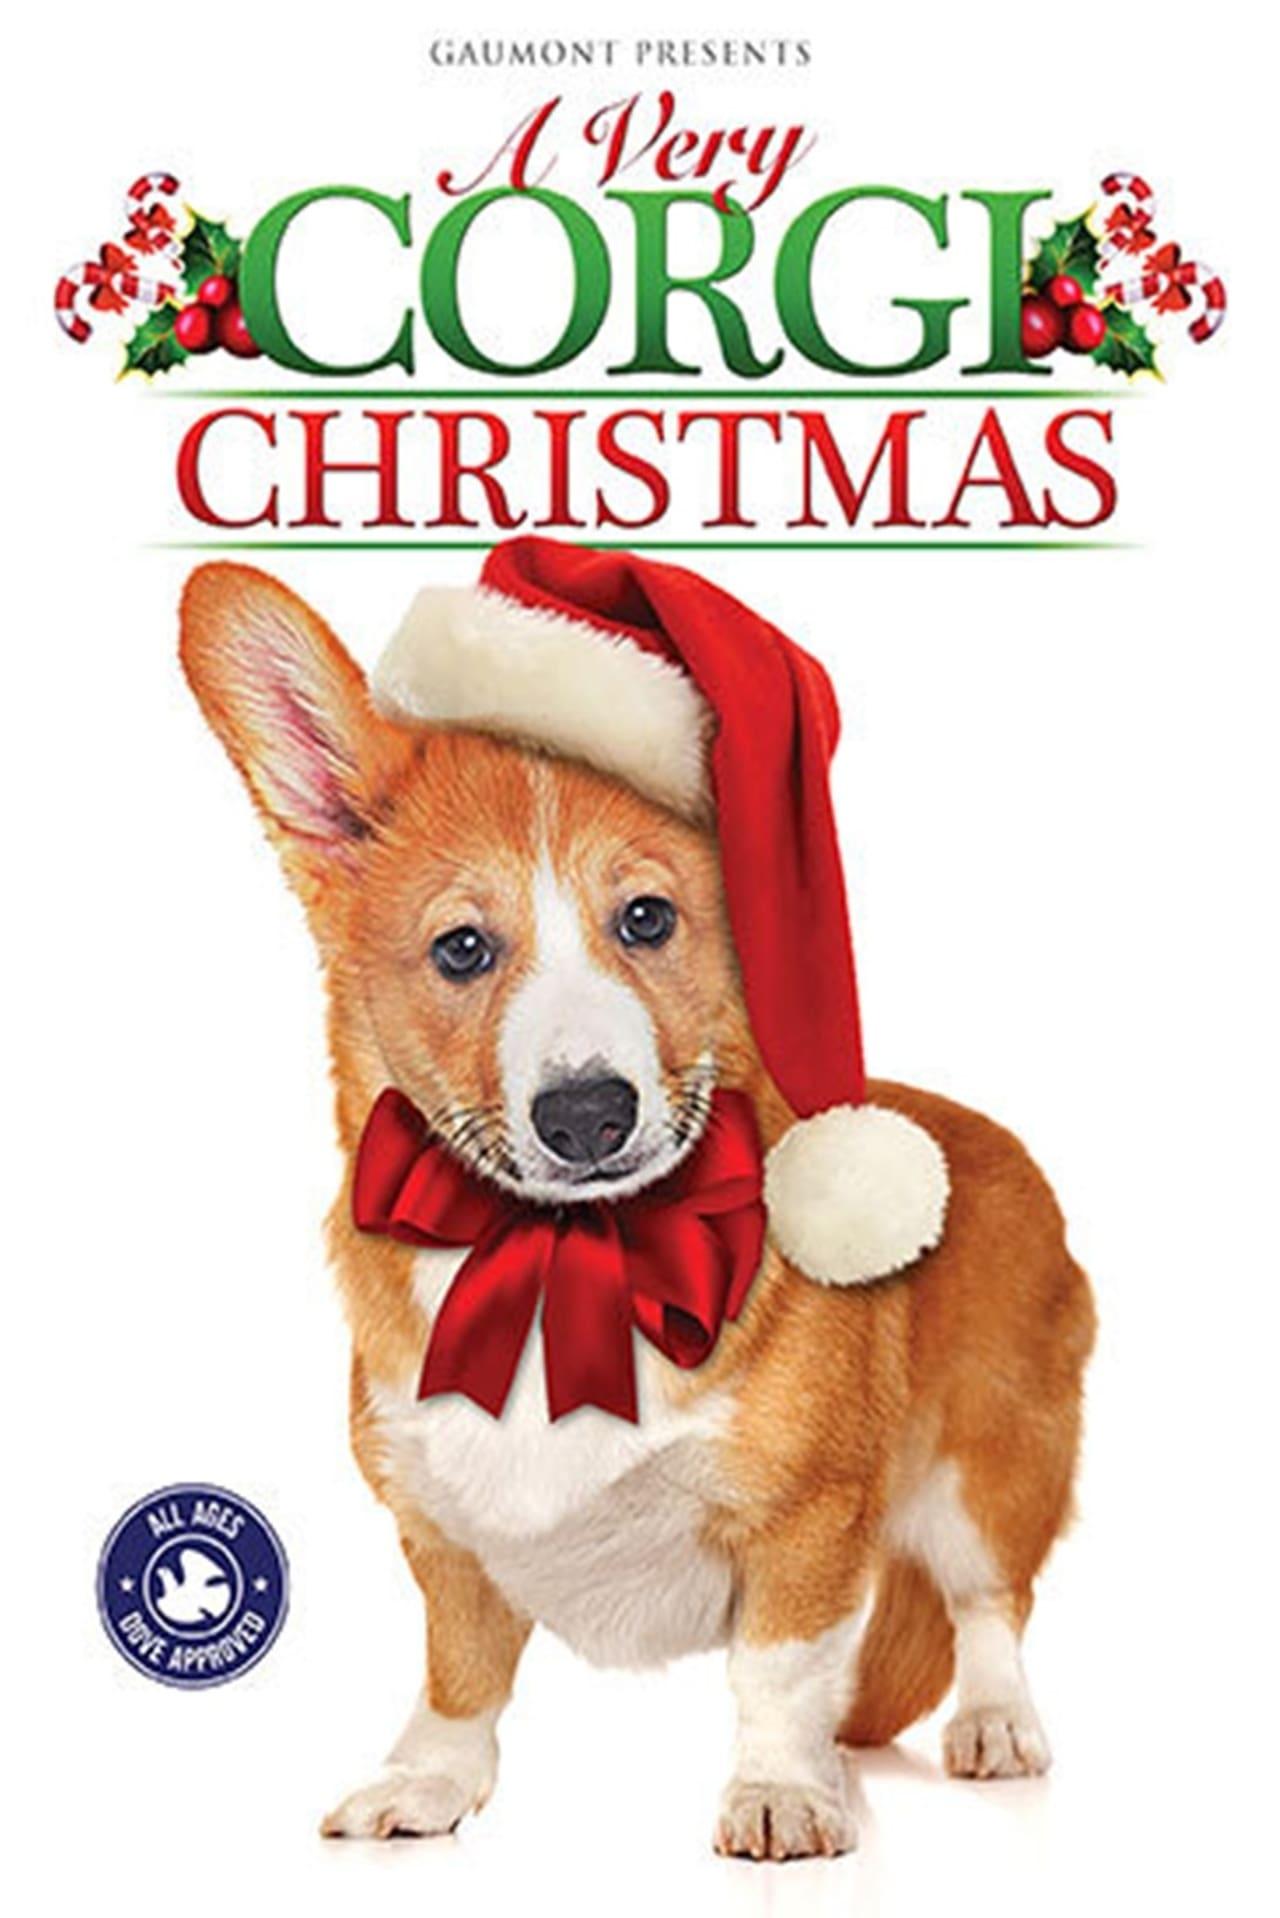 A Very Corgi Christmas Free movie online at 123movies